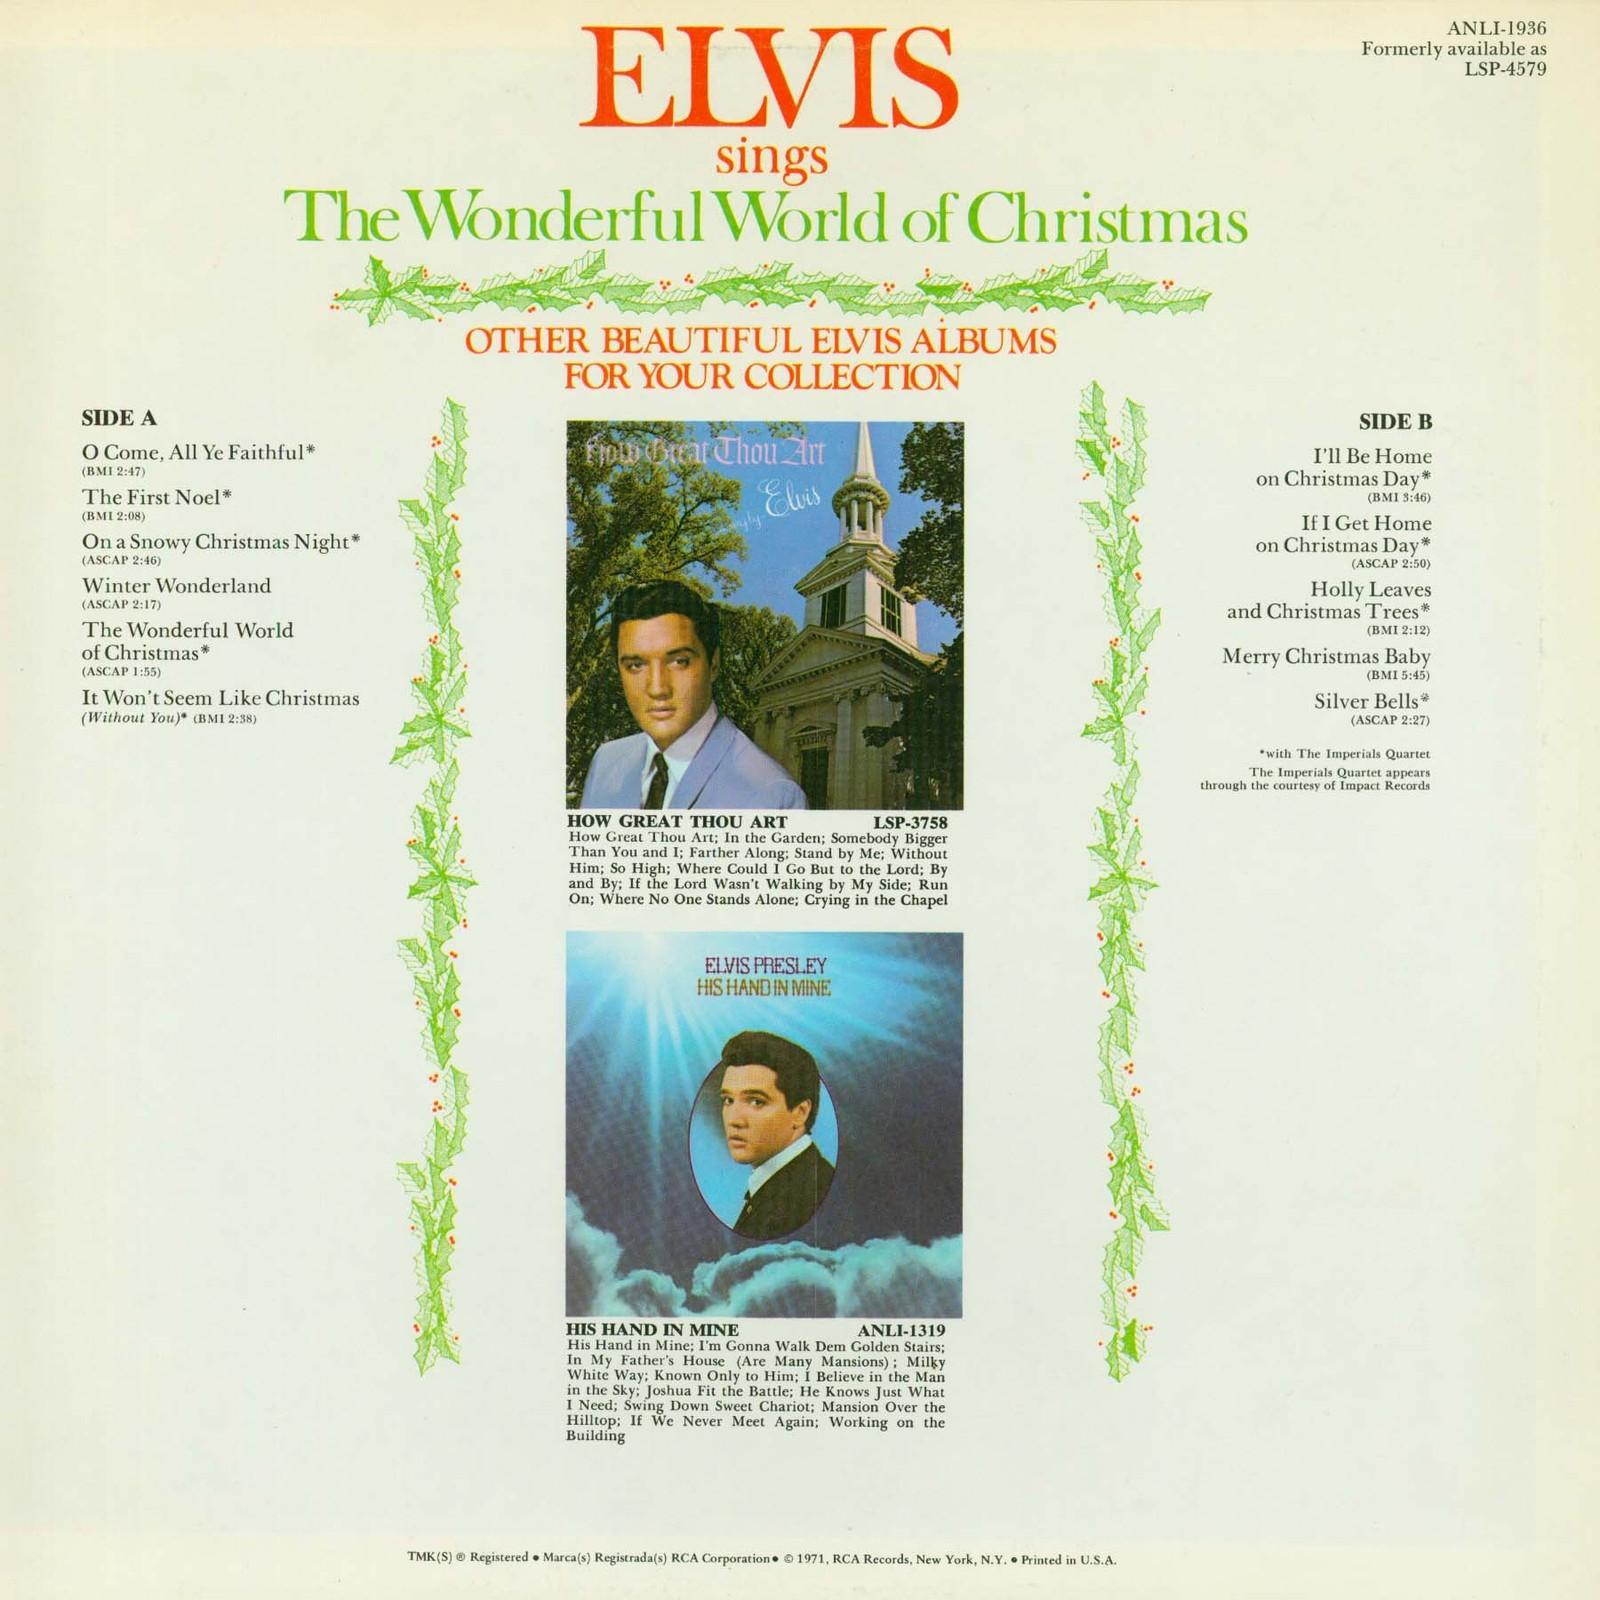 ELVIS SINGS THE WONDERFUL WORLD OF CHRISTMAS 0250slu